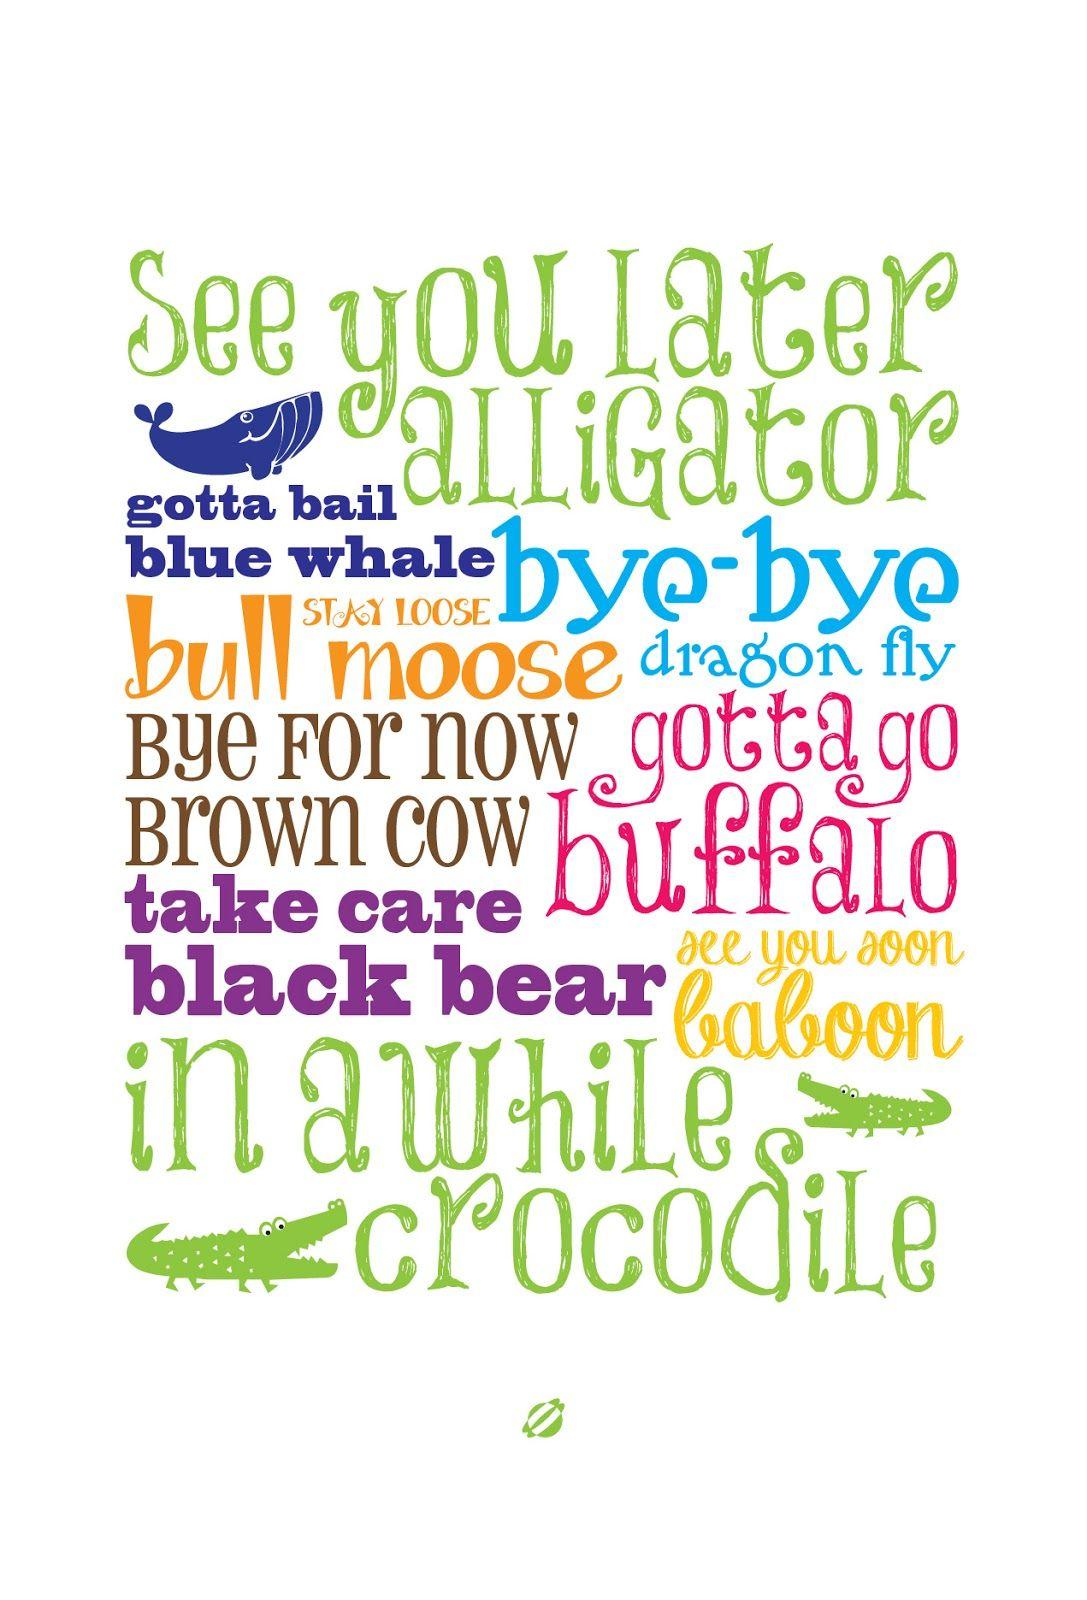 Free Printable Nursery Wall Art ♥ // Lostbumblebee @tabitha - See You Later Alligator Free Printable